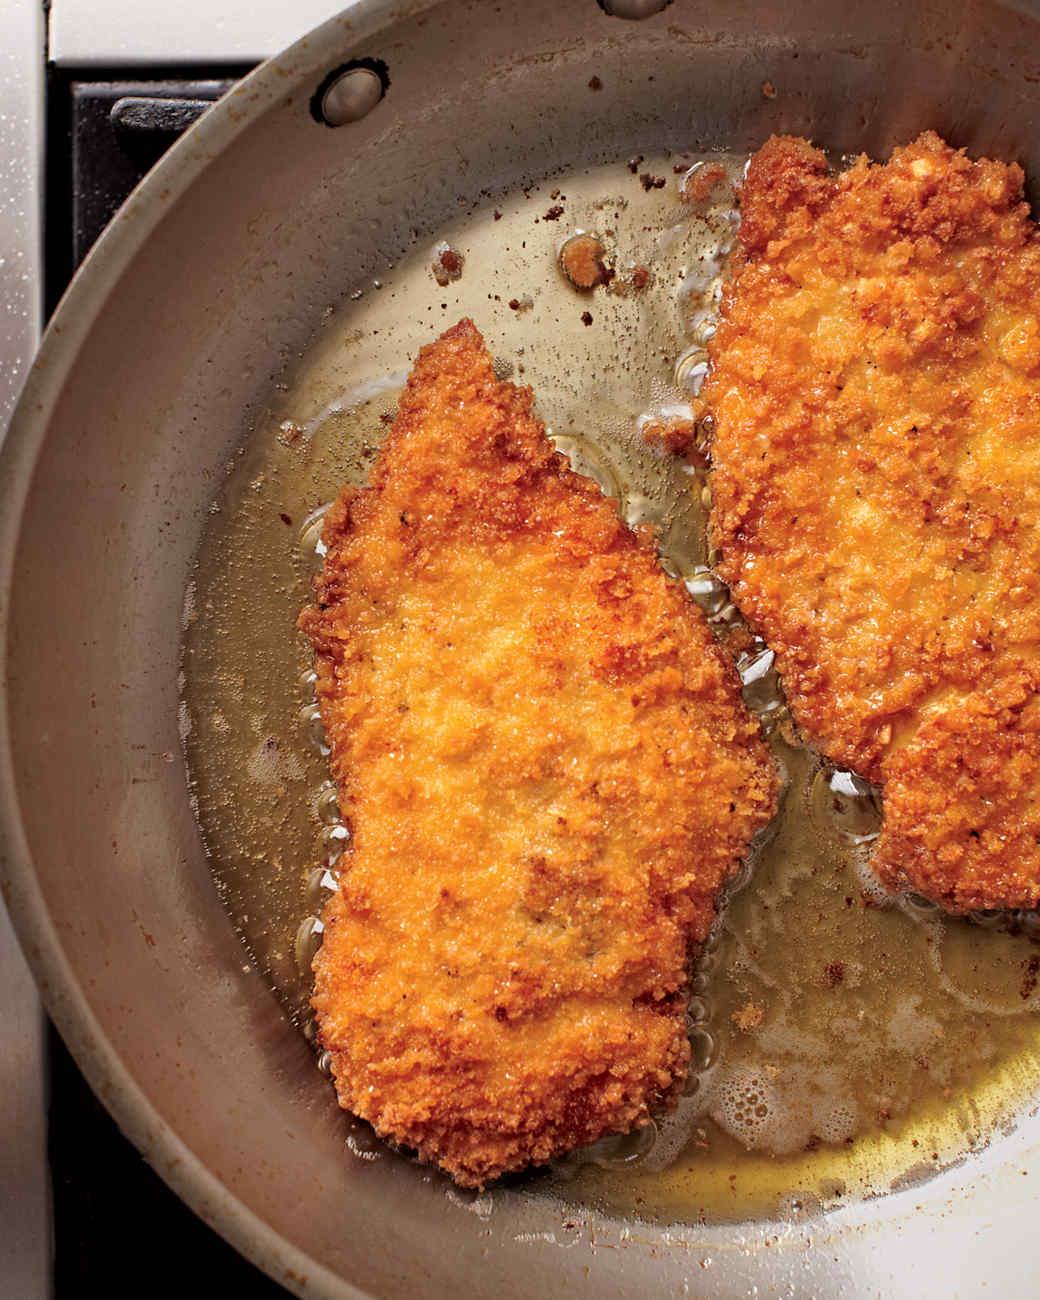 frying-chicken3-mld108081.jpg